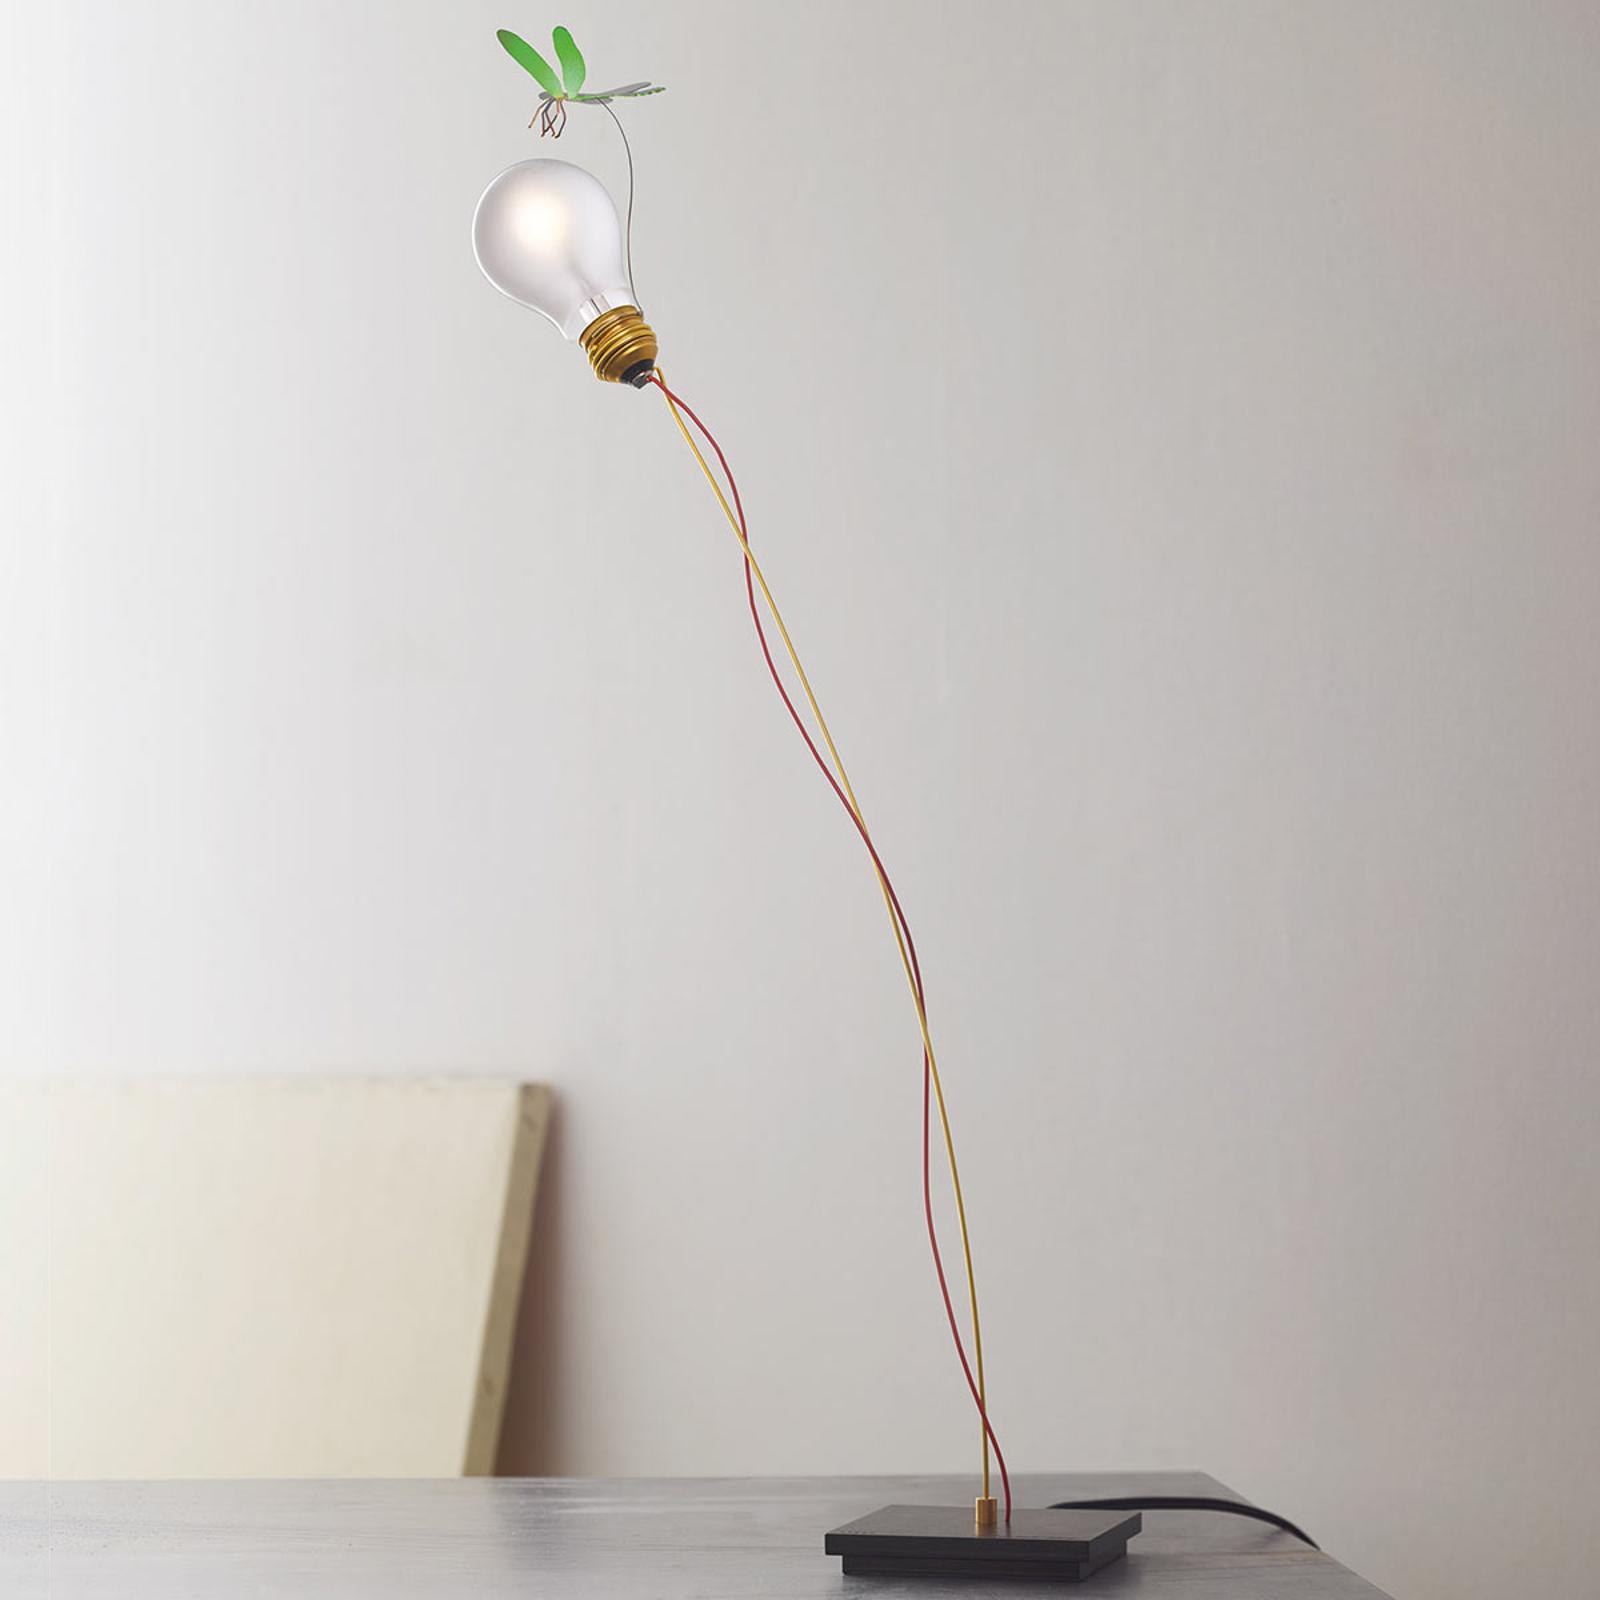 Tafellamp I Ricchi Poveri Bzzzz - groene libel